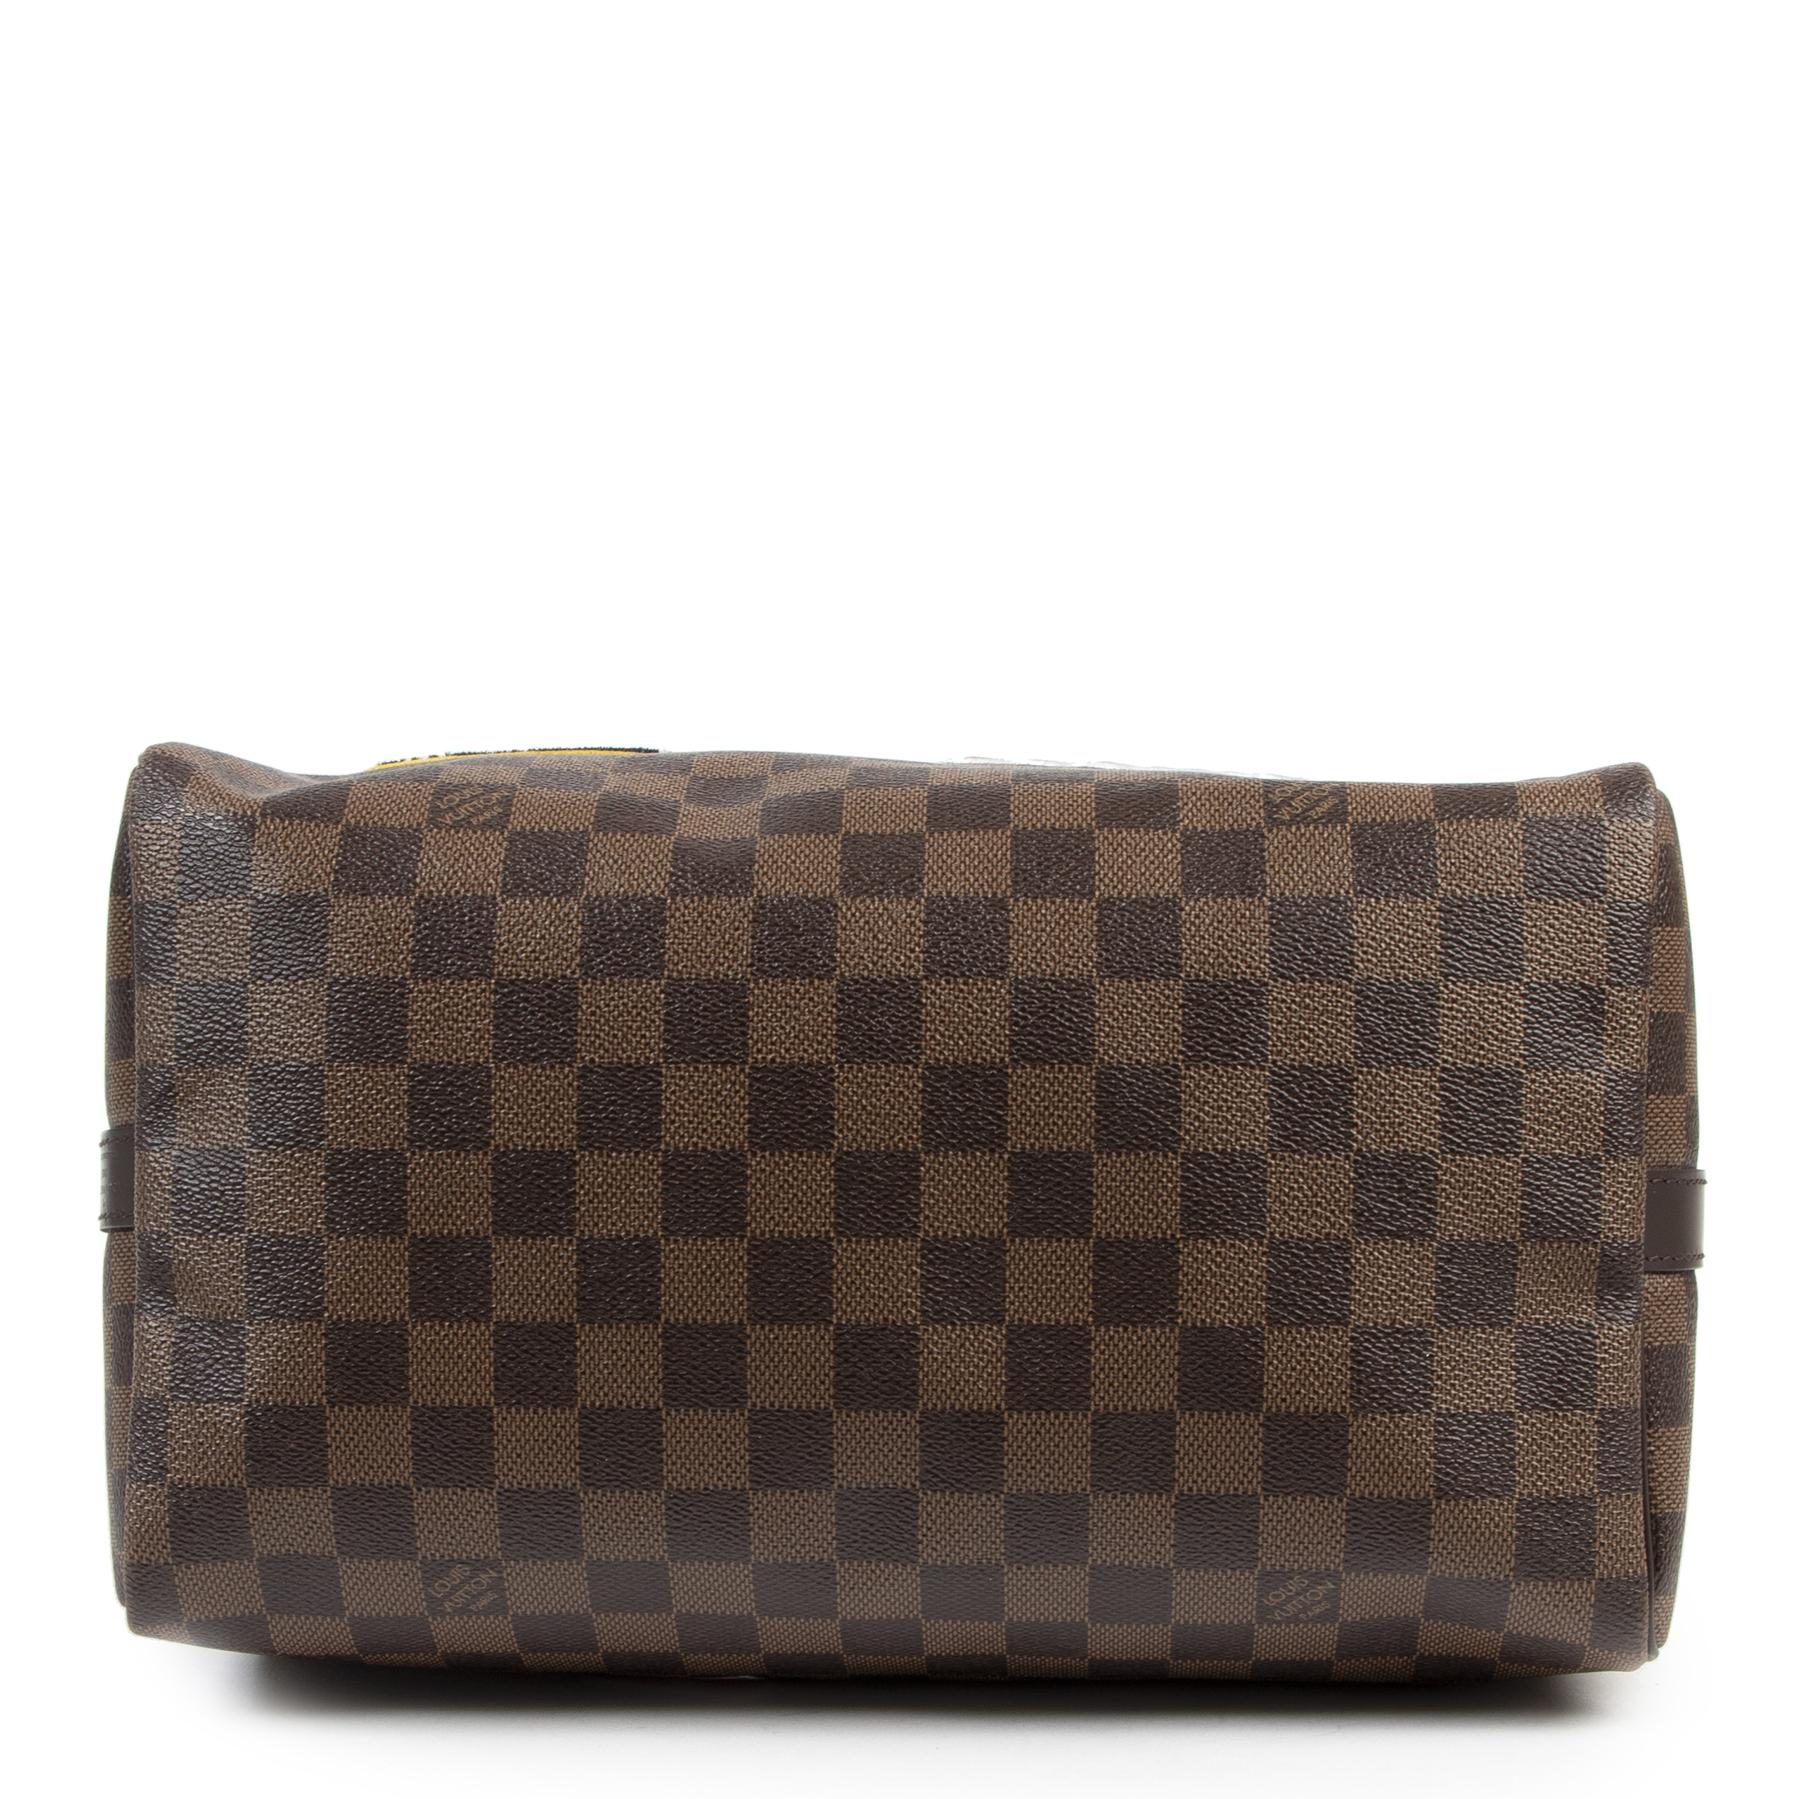 Authentieke tweedehands vintage Louis Vuitton Brown Patches Speedy Bandoulière 30 koop online webshop LabelLOV